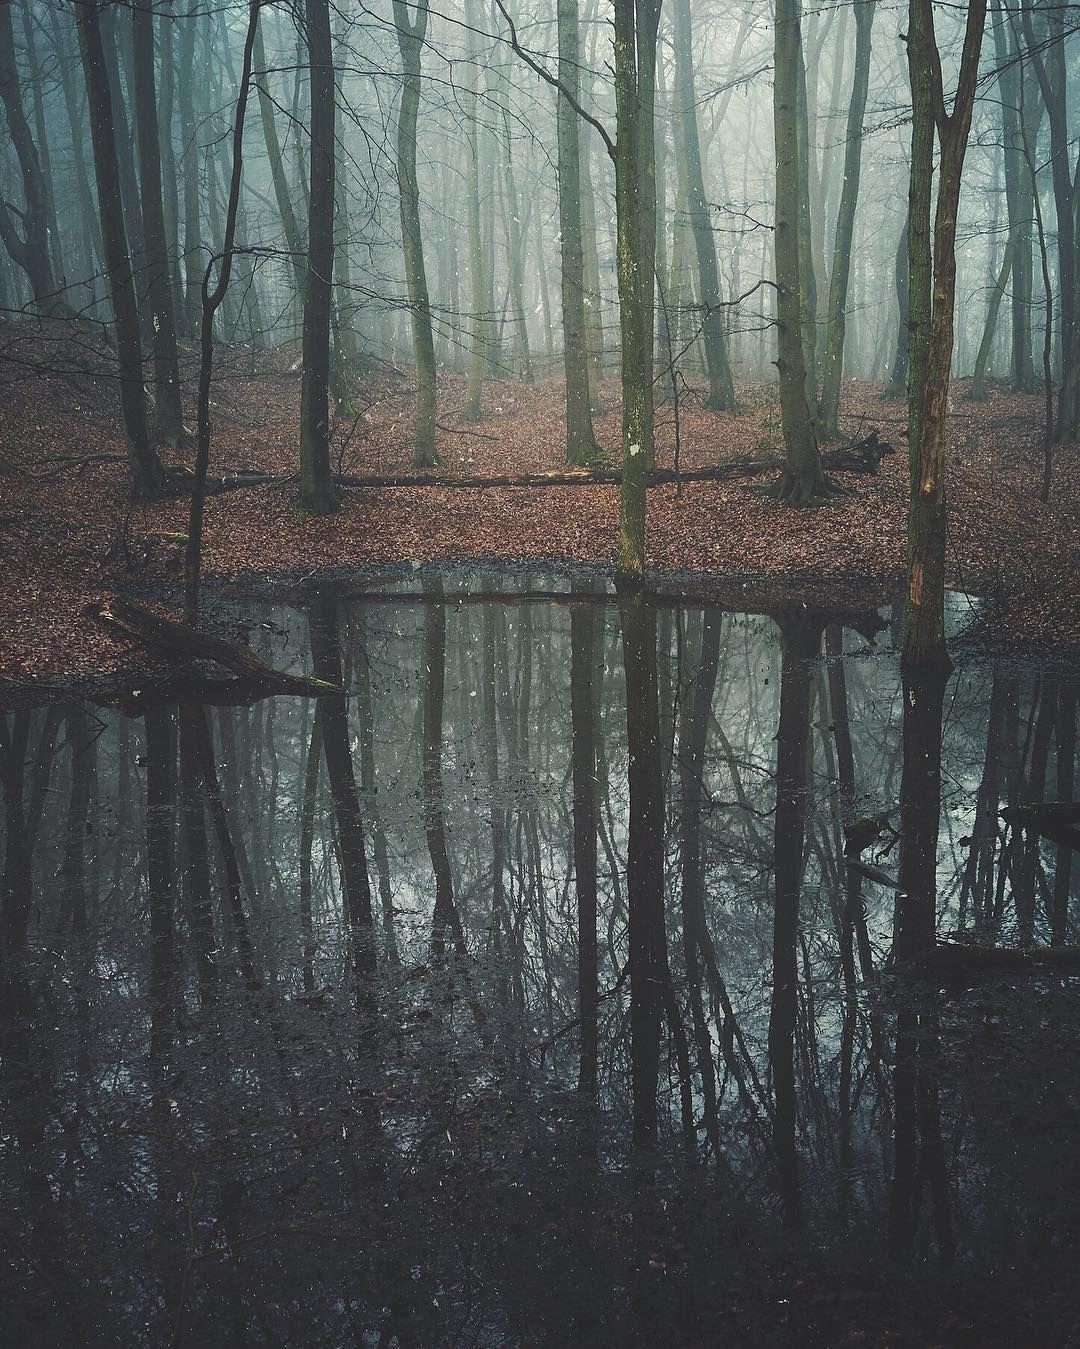 Black Pool Revisited  #jj_mextures #m3xtures #mextures #mellow_mextures #mexturescollective #sombrescapes #sombresociety #soft_vision  #enchantedforest #darkness #beautifuldarkness #grimness  #rsa_dark #pr0ject_uno  #pixelpanda #tree_brilliance #treehugger #tree_captures #tree_magic  #mist_vision #mistyforest #dontgiveafog #foggyshots #mmmdatfog #chasingfog #mist_bestshots #mistyfoggymilkymoody #moodygrams